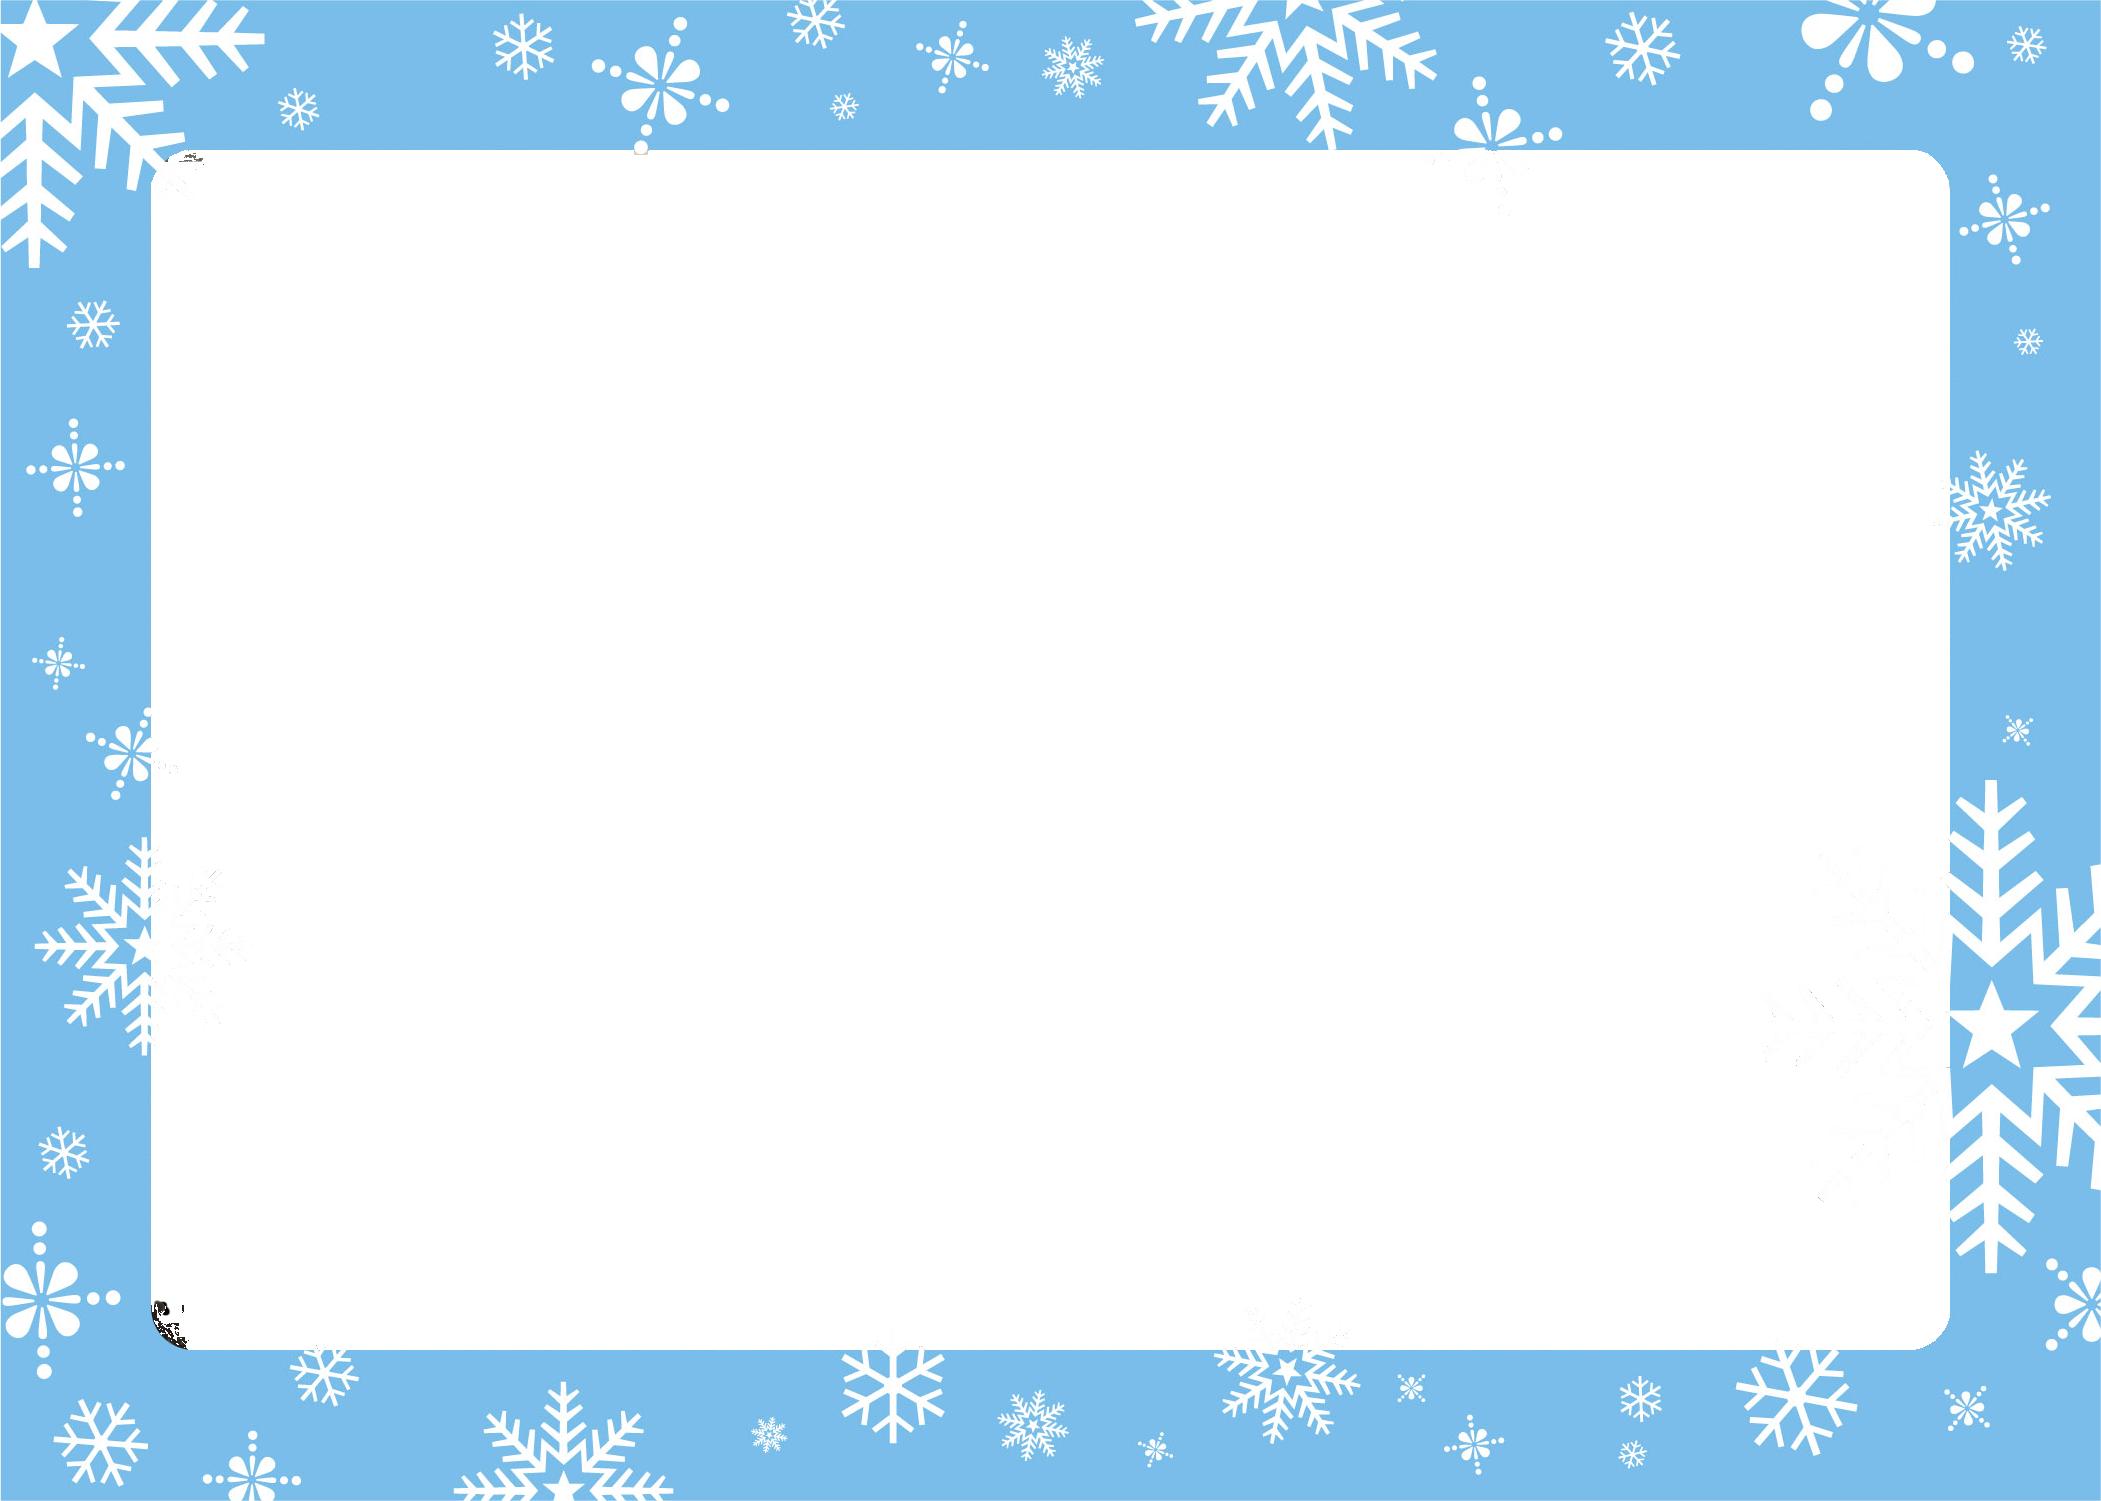 Winter border png. Snowflake graphic free techflourish